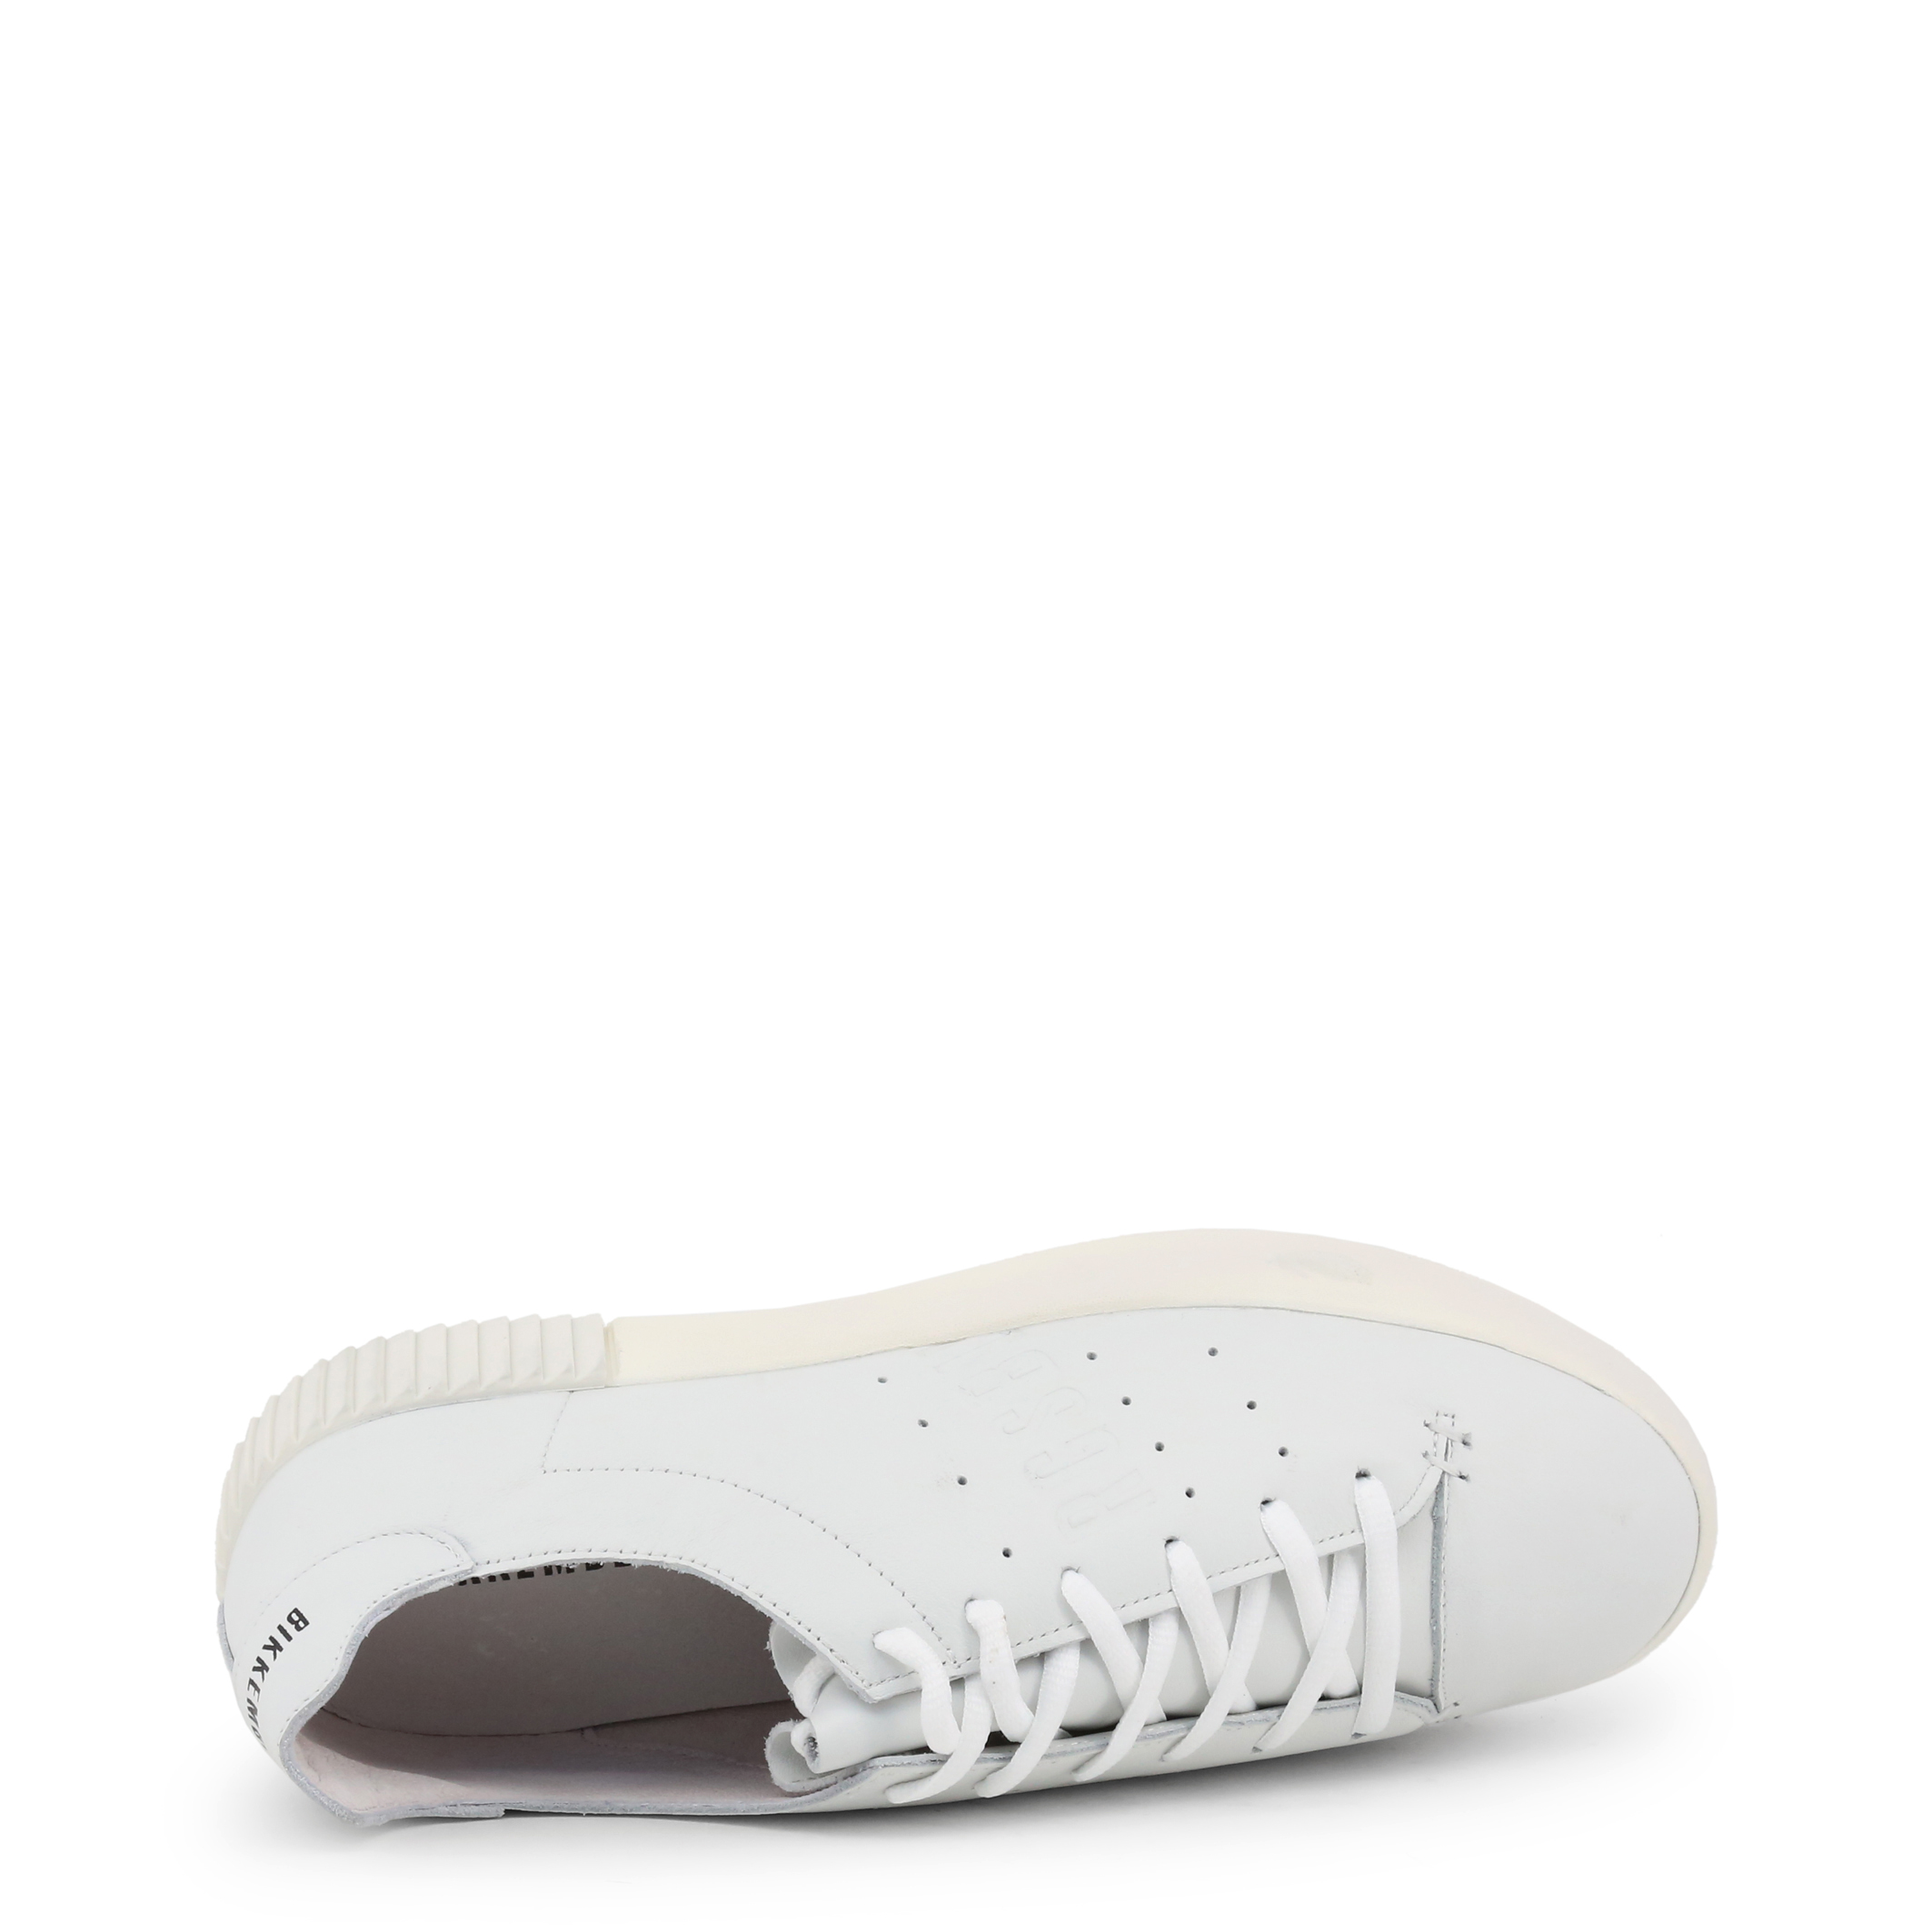 Chaussures de ville  Bikkembergs COSMOS_2100 white